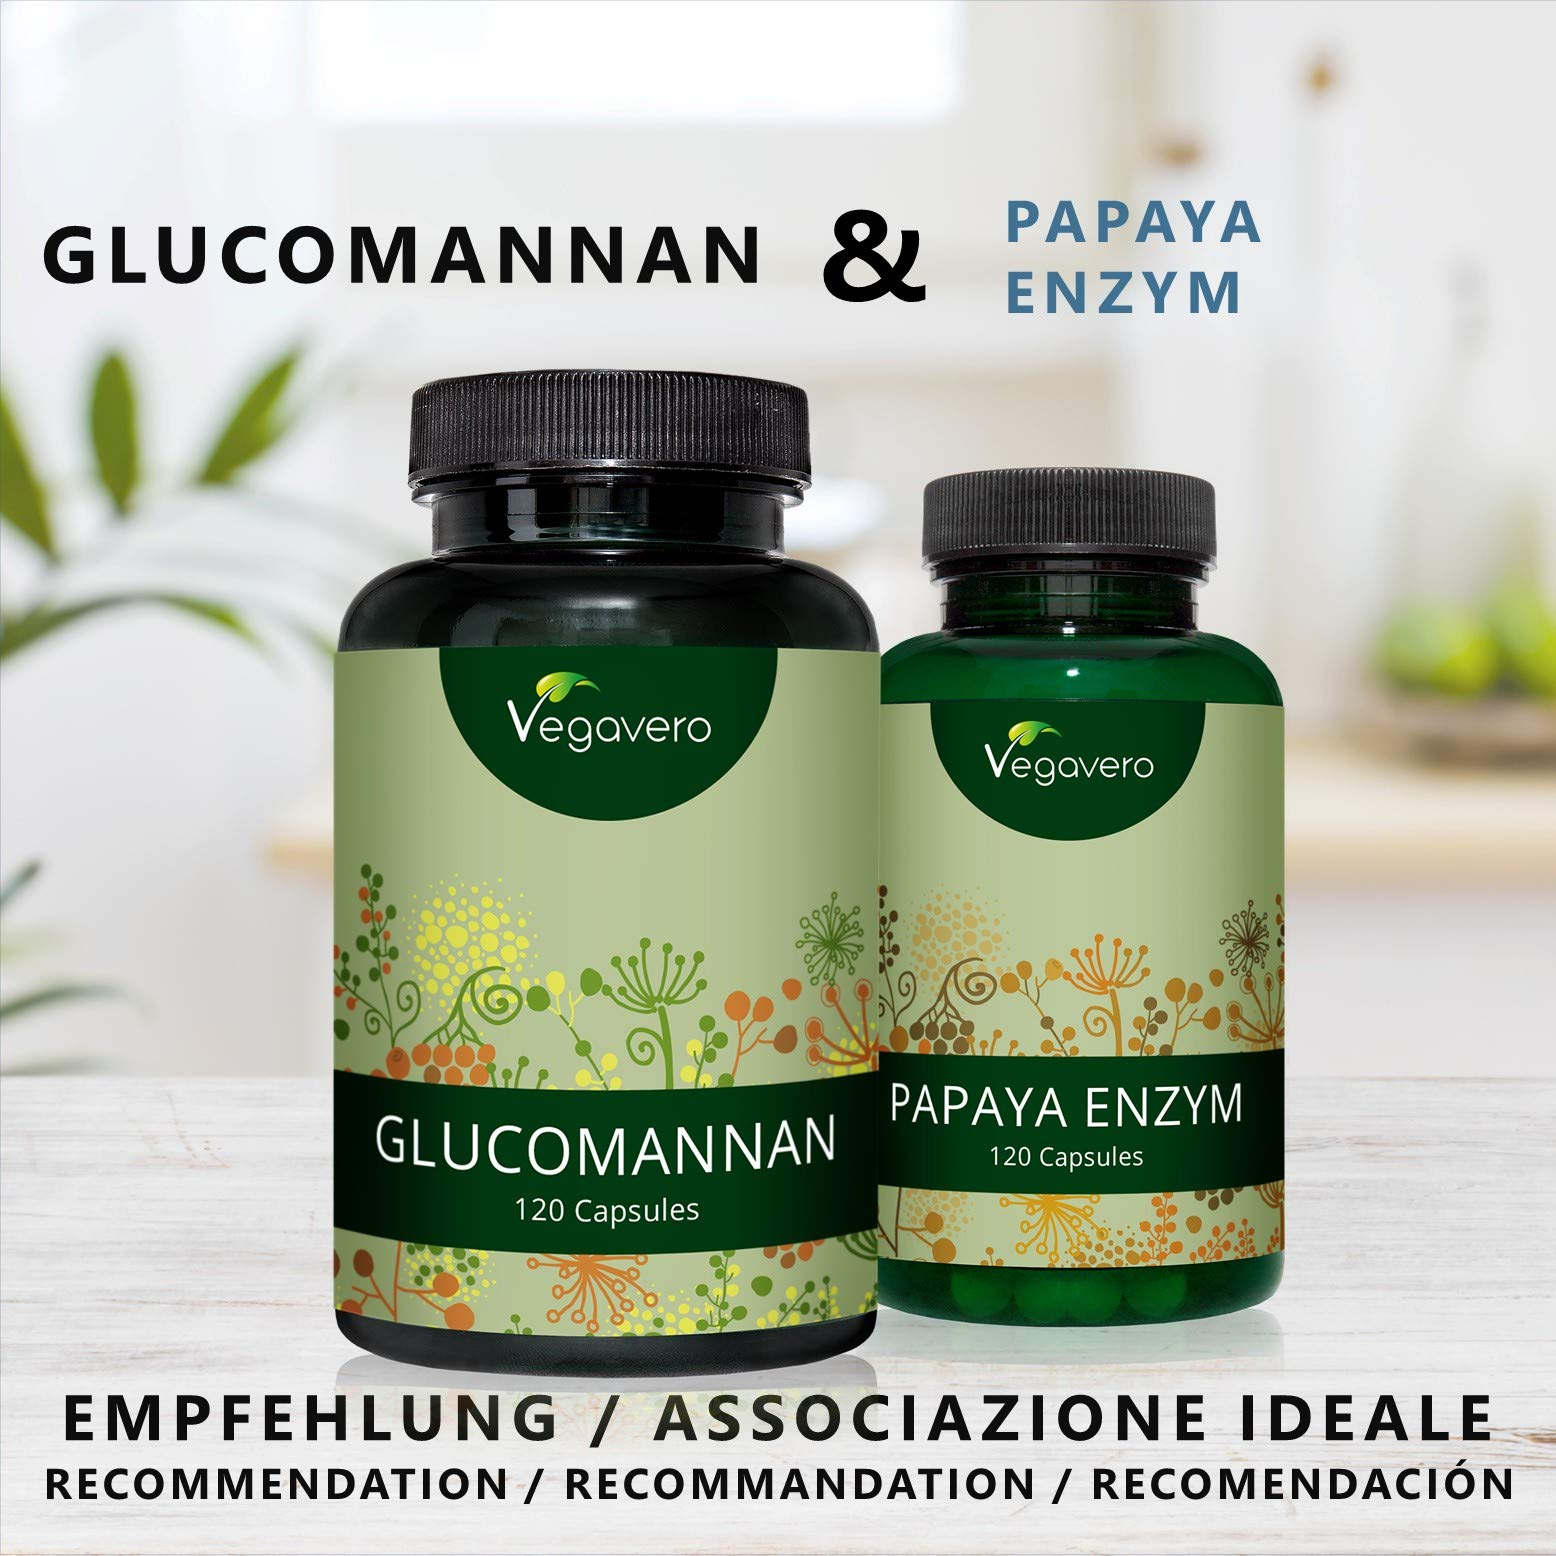 Glucomannan | 550 mg, 120 Capsules | Konjac Root Fibre | Weight Loss, Appetite Reduction, Better Digestion | Vegan & Vegetarian by Vegavero